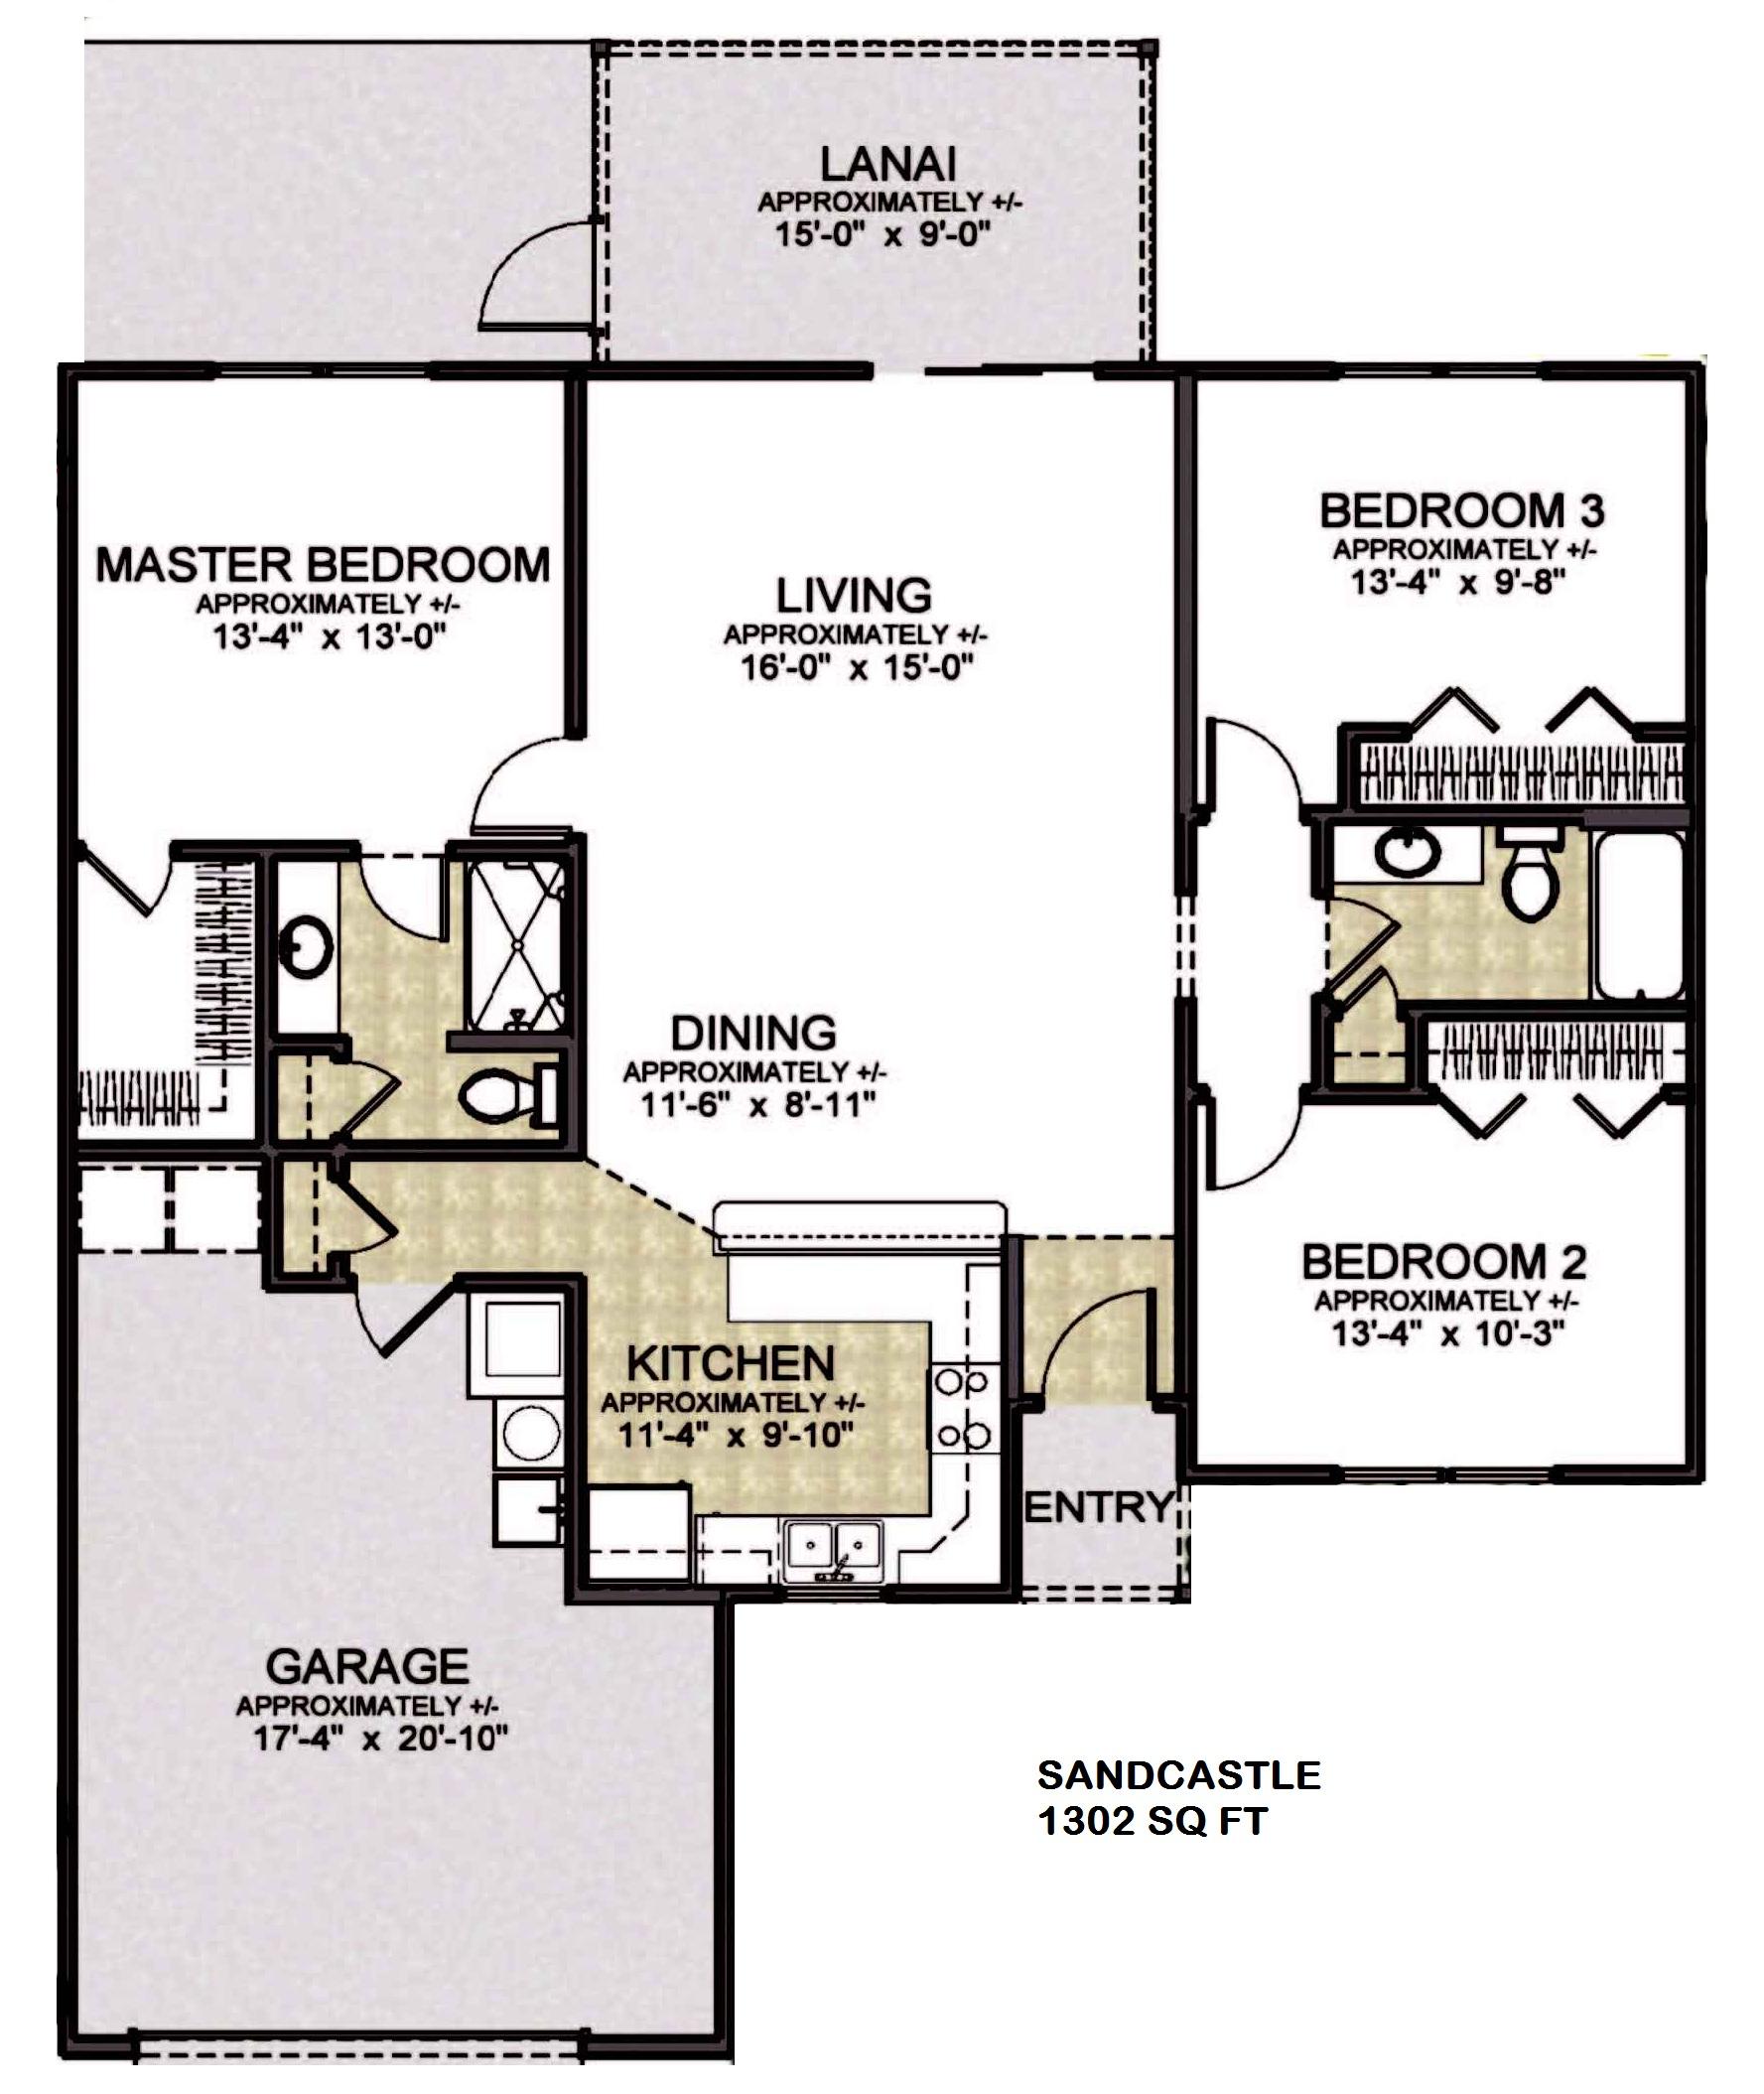 The villages home floor plans 28 images cedar for The villages gardenia floor plan